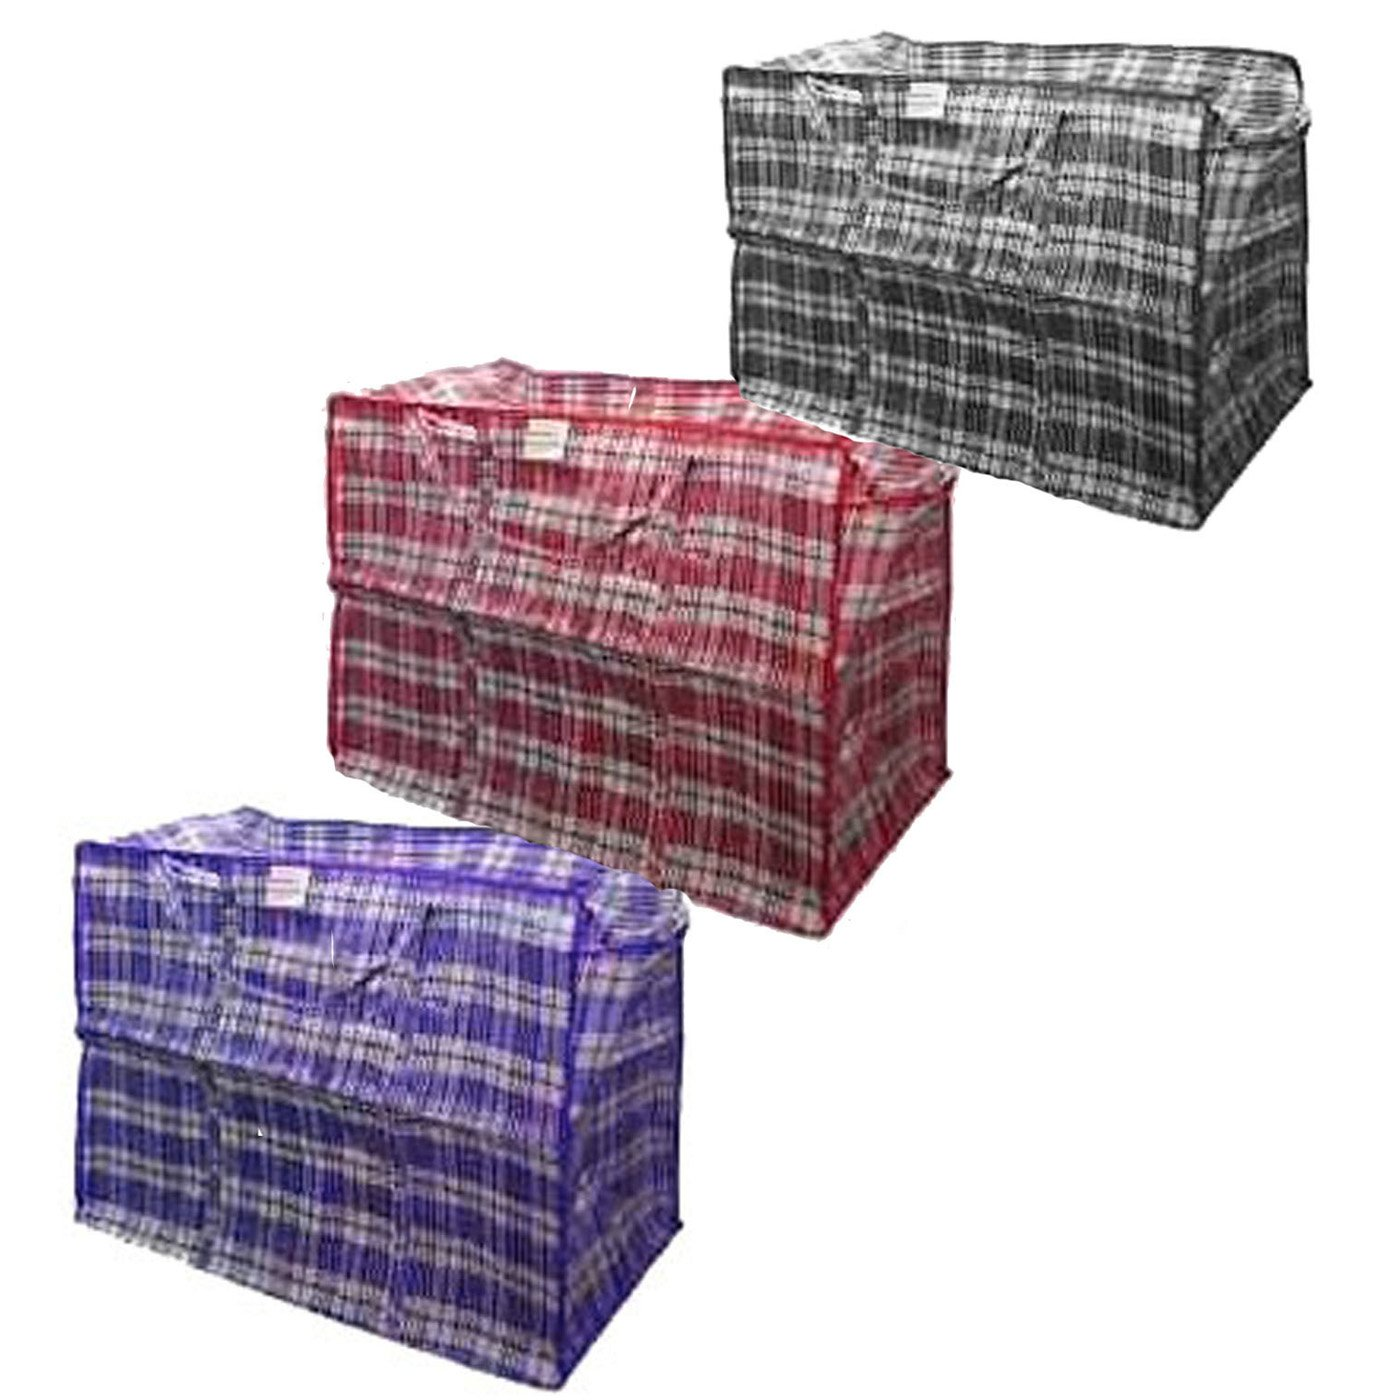 Jumbo Laundry Bag Silverstand